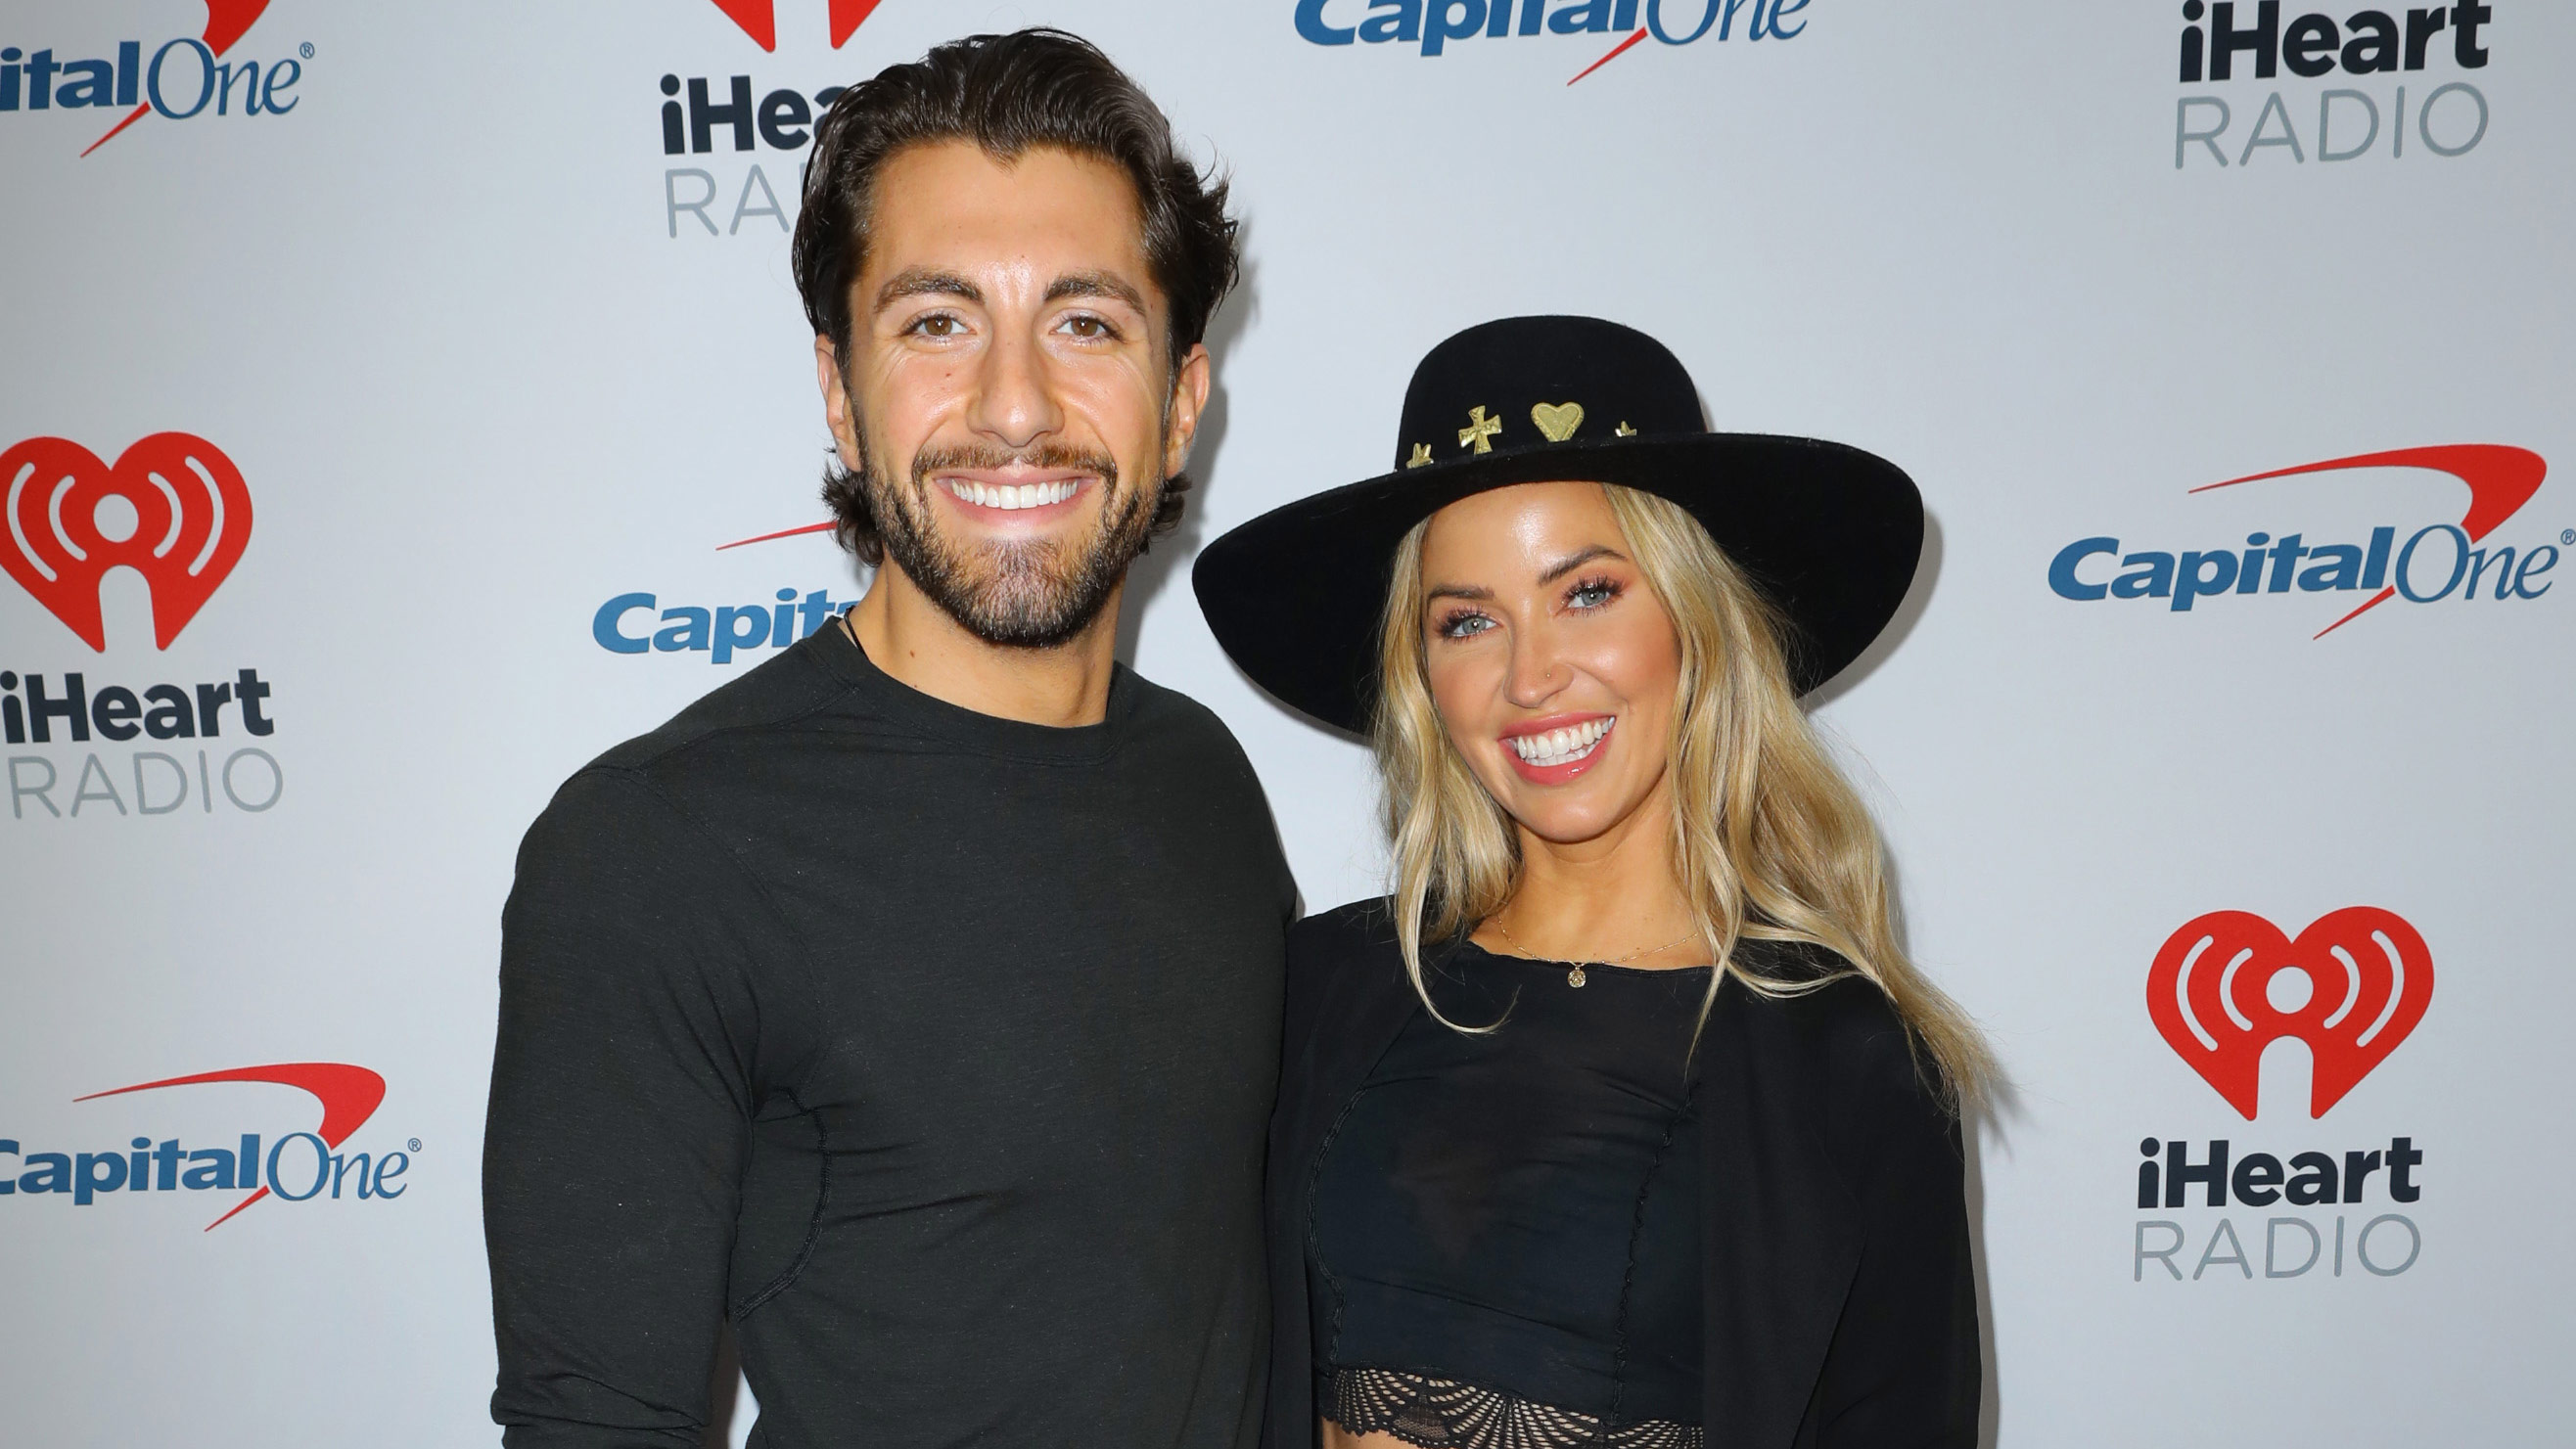 'Bachelorette's' Kaitlyn Bristowe engaged to Jason Tartick